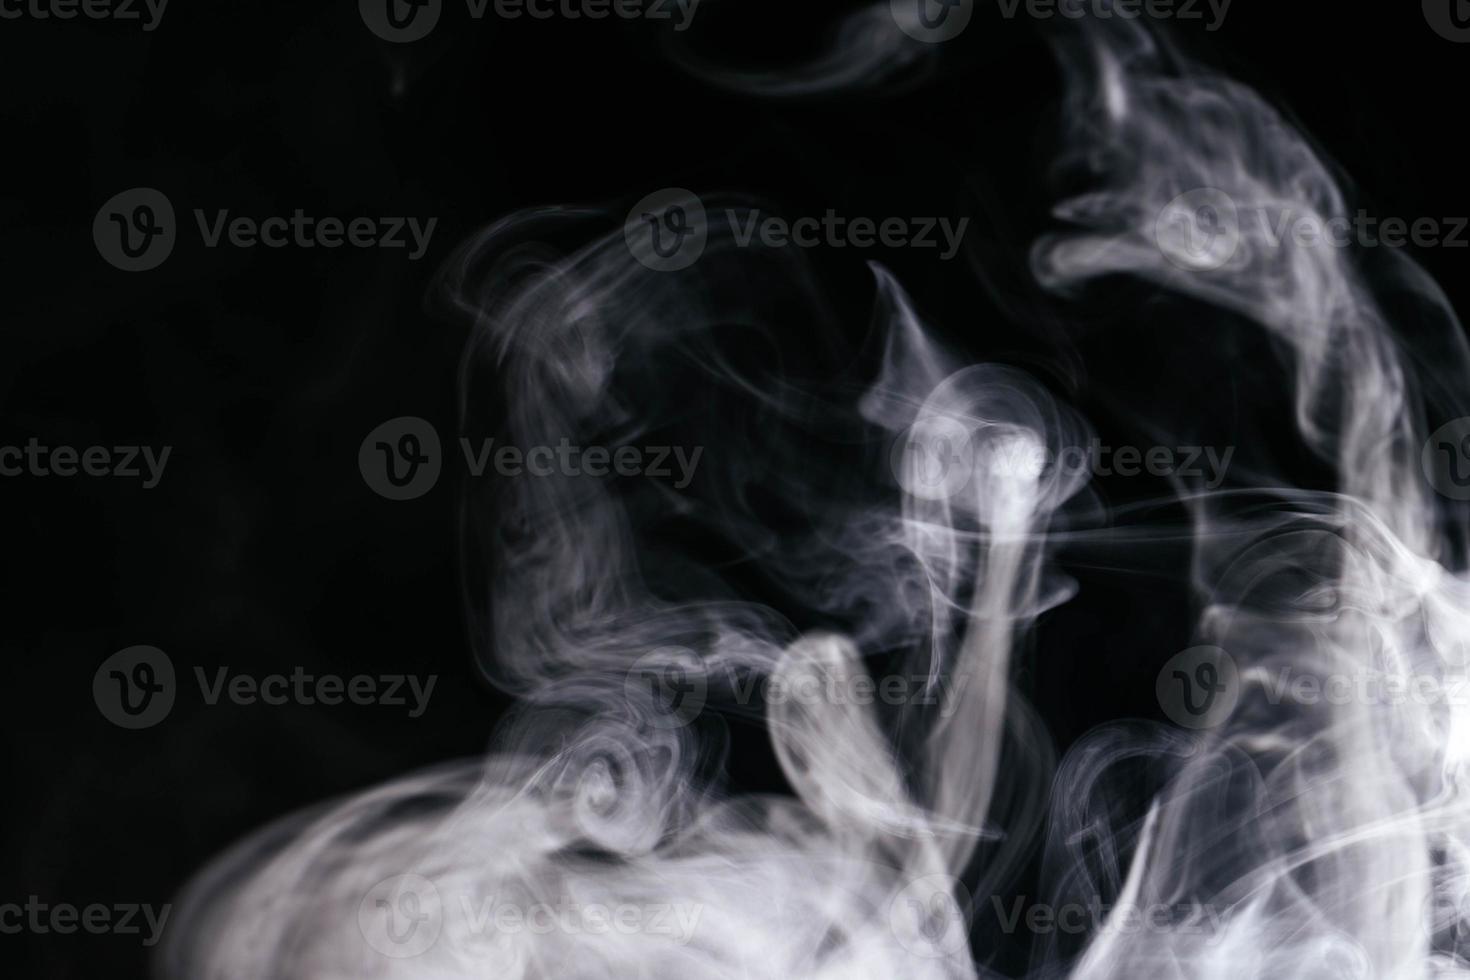 grå rök vinkar svart bakgrund foto